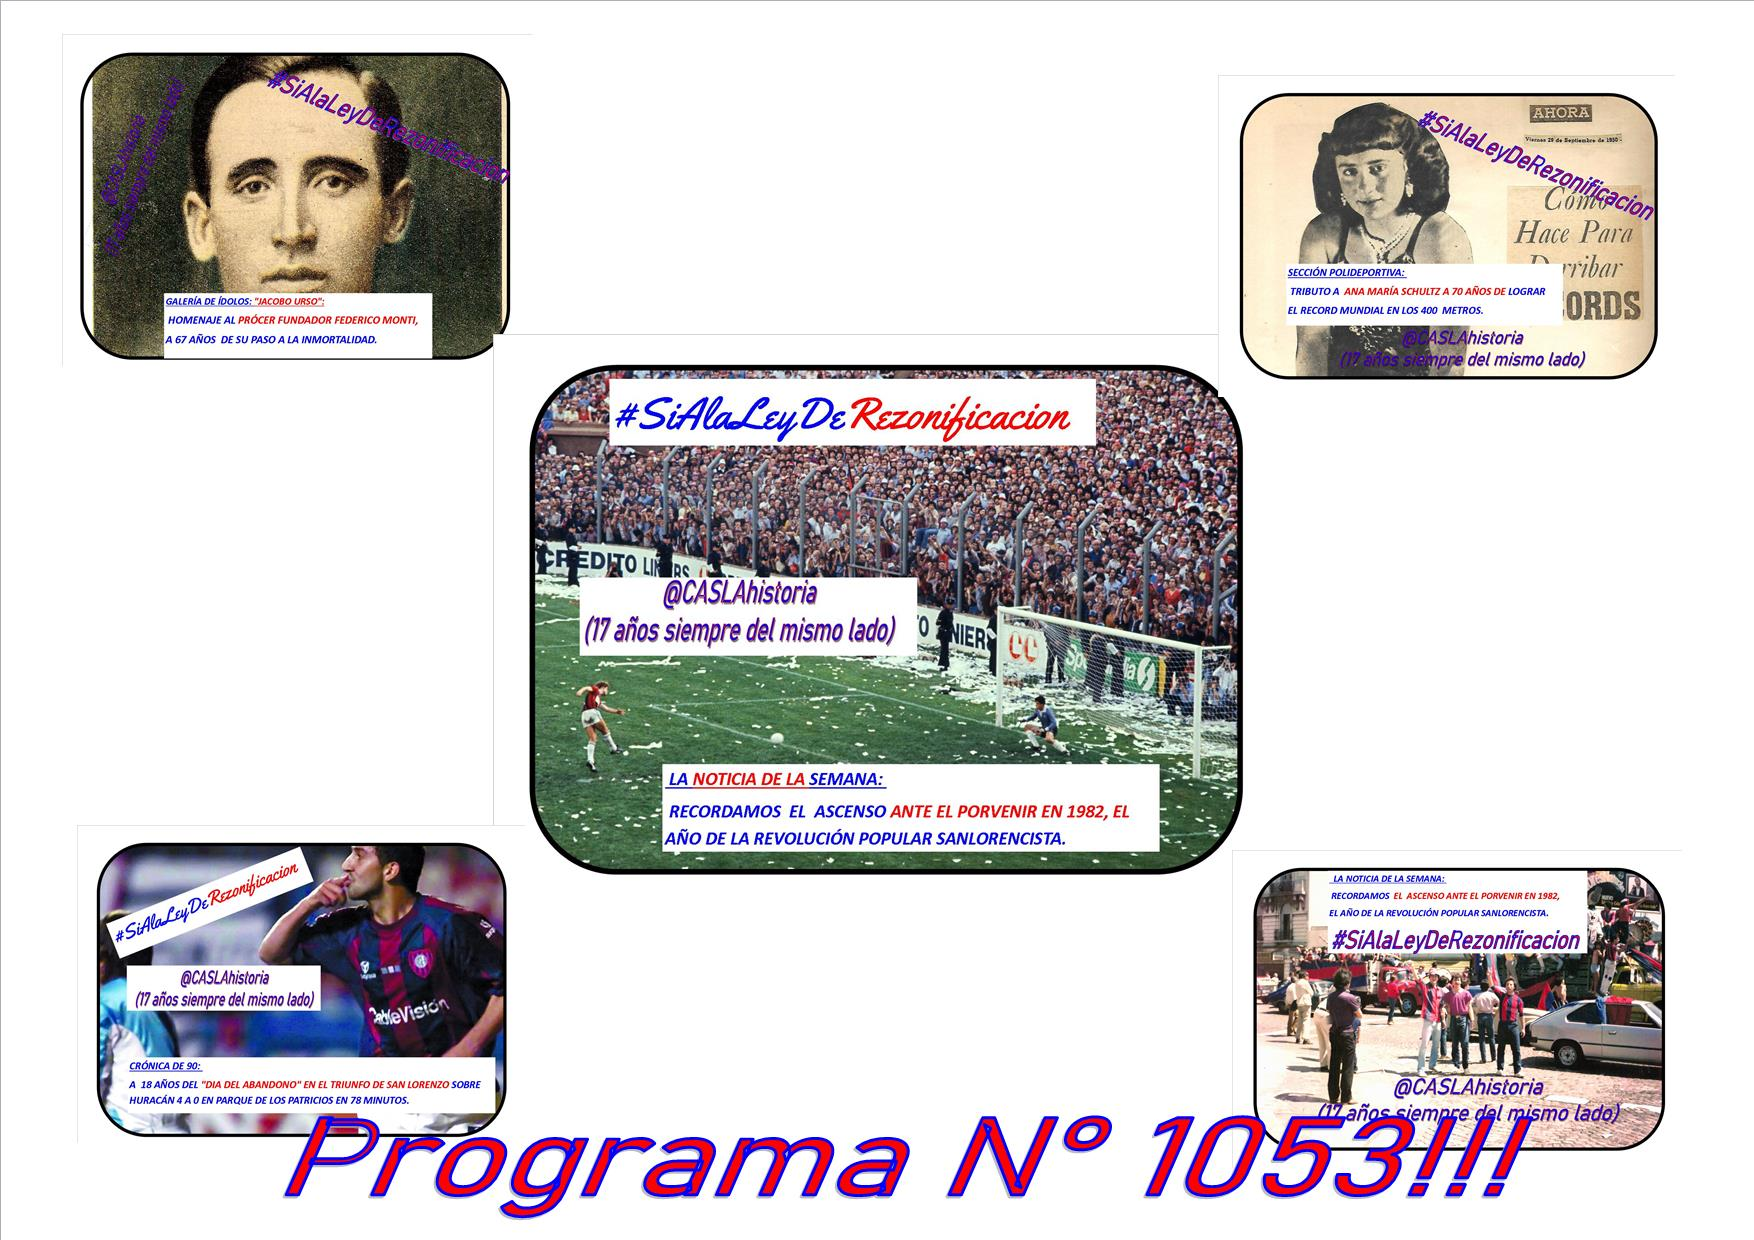 Programa N° 1053.»Ascenso 82, el Procer Federico,Ana Maria Schultz,Alfredo Sanchez»